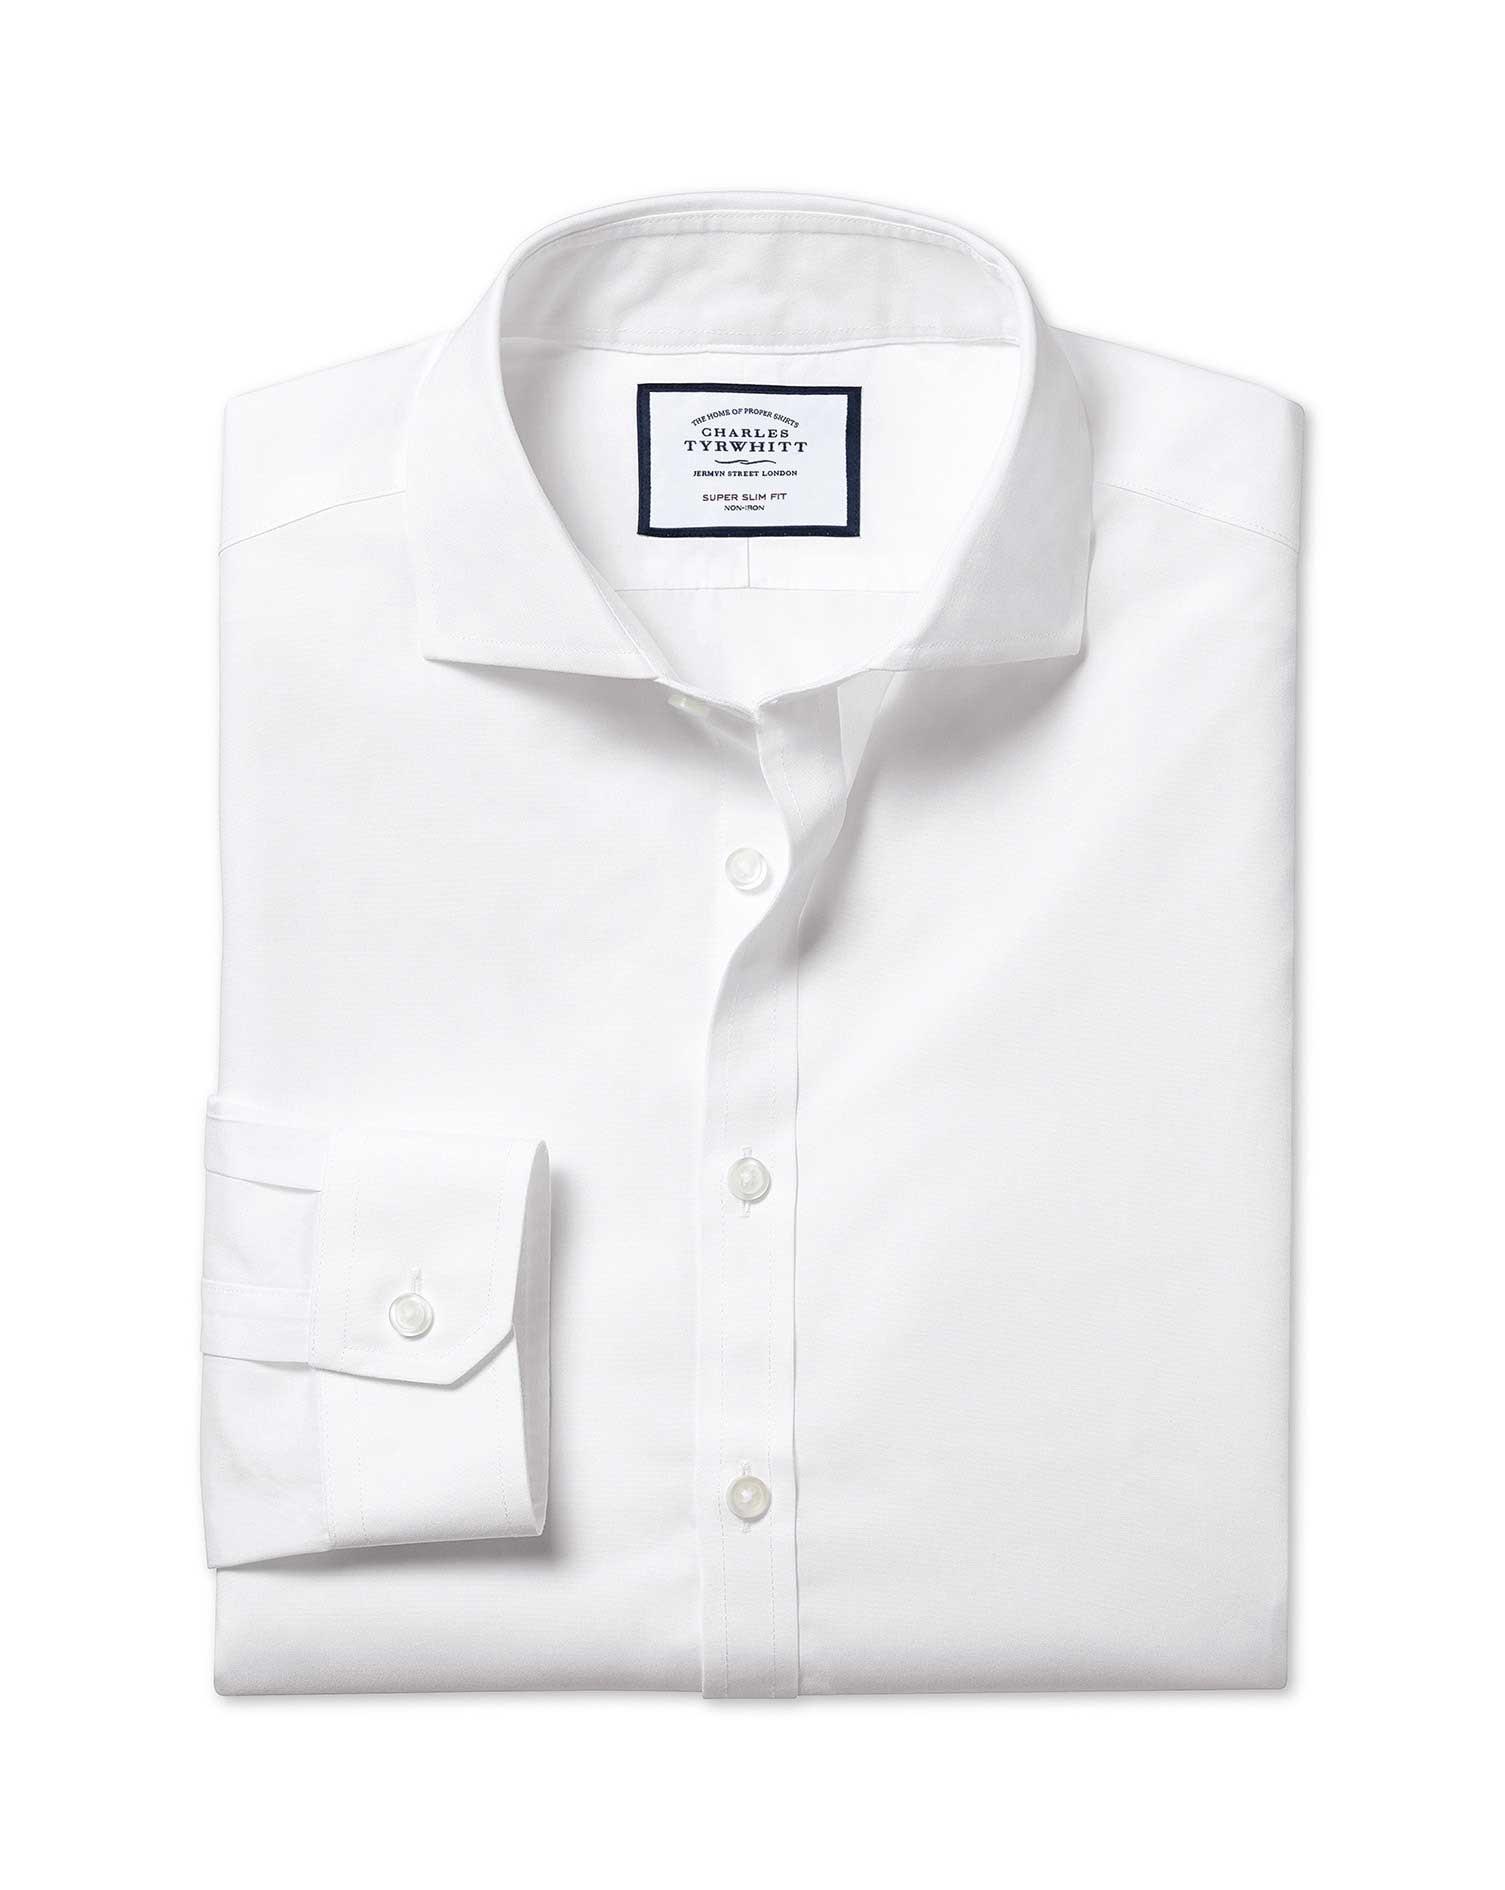 Super Slim Fit White Non-Iron Poplin Cotton Formal Shirt Single Cuff Size 16/36 by Charles Tyrwhitt